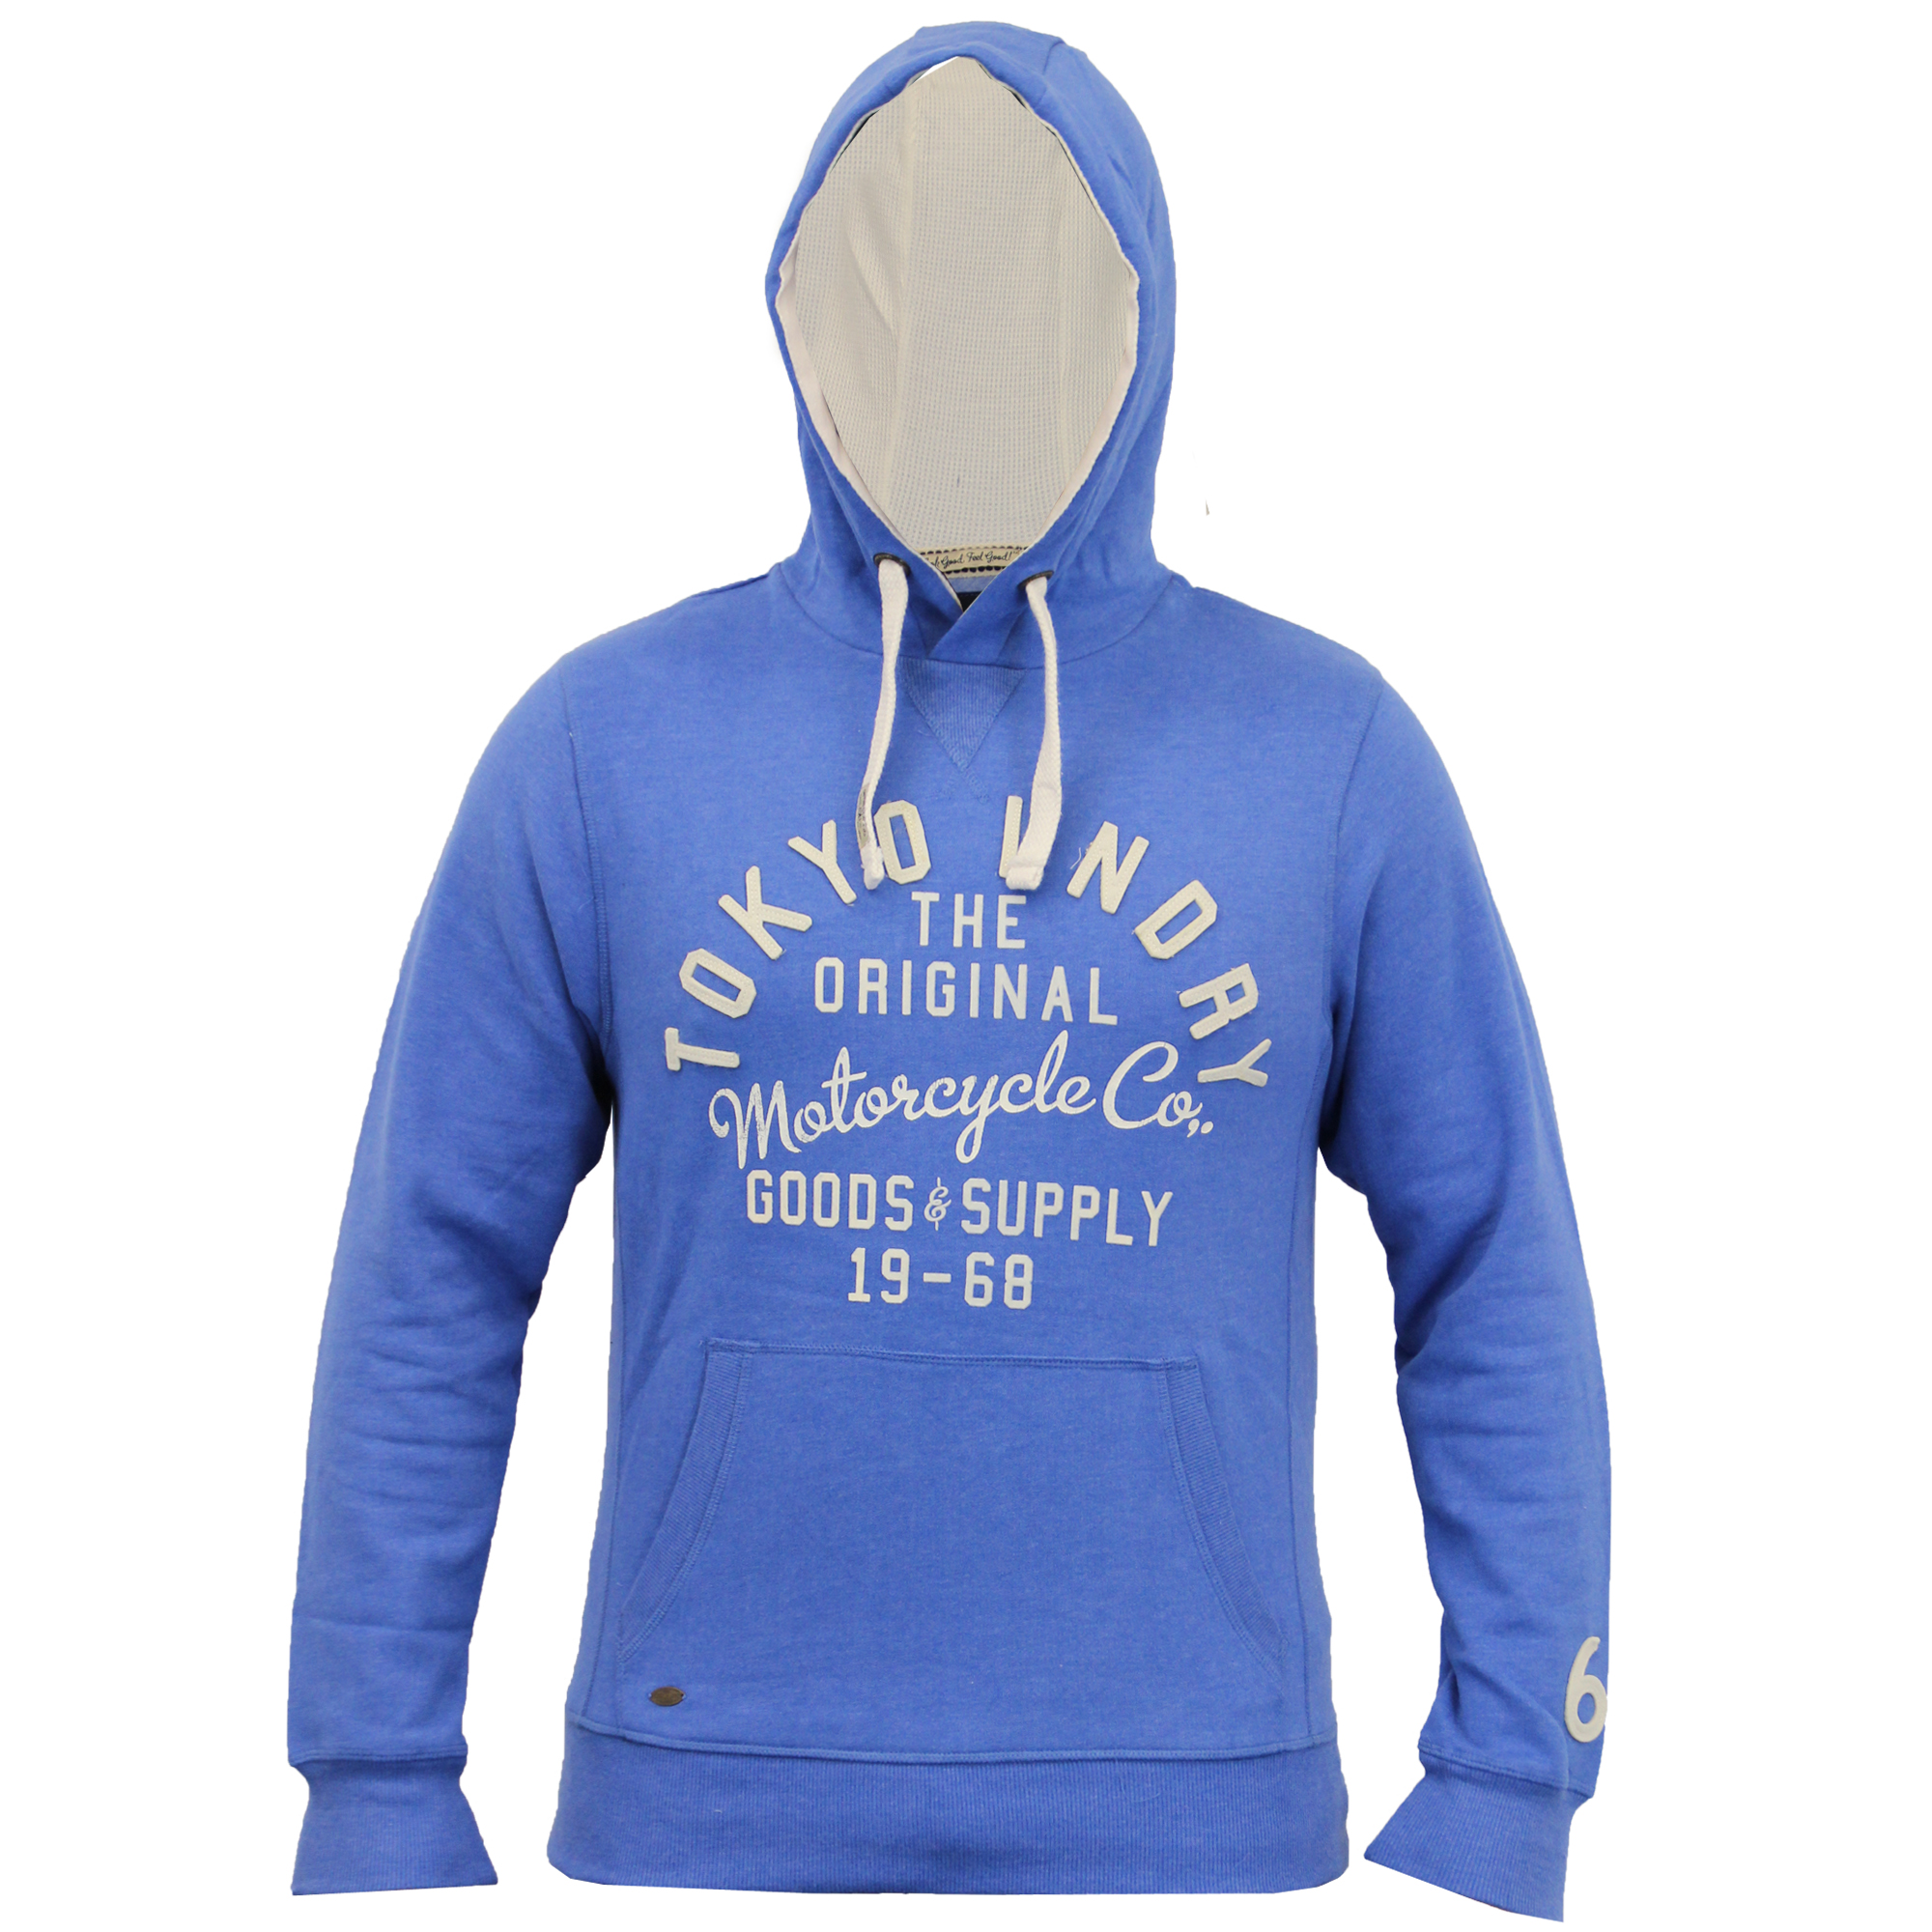 Mens-Sweatshirt-Tokyo-Laundry-Hooded-Top-Sweat-Applique-Zip-Gym-Fleece-Lined-New thumbnail 8